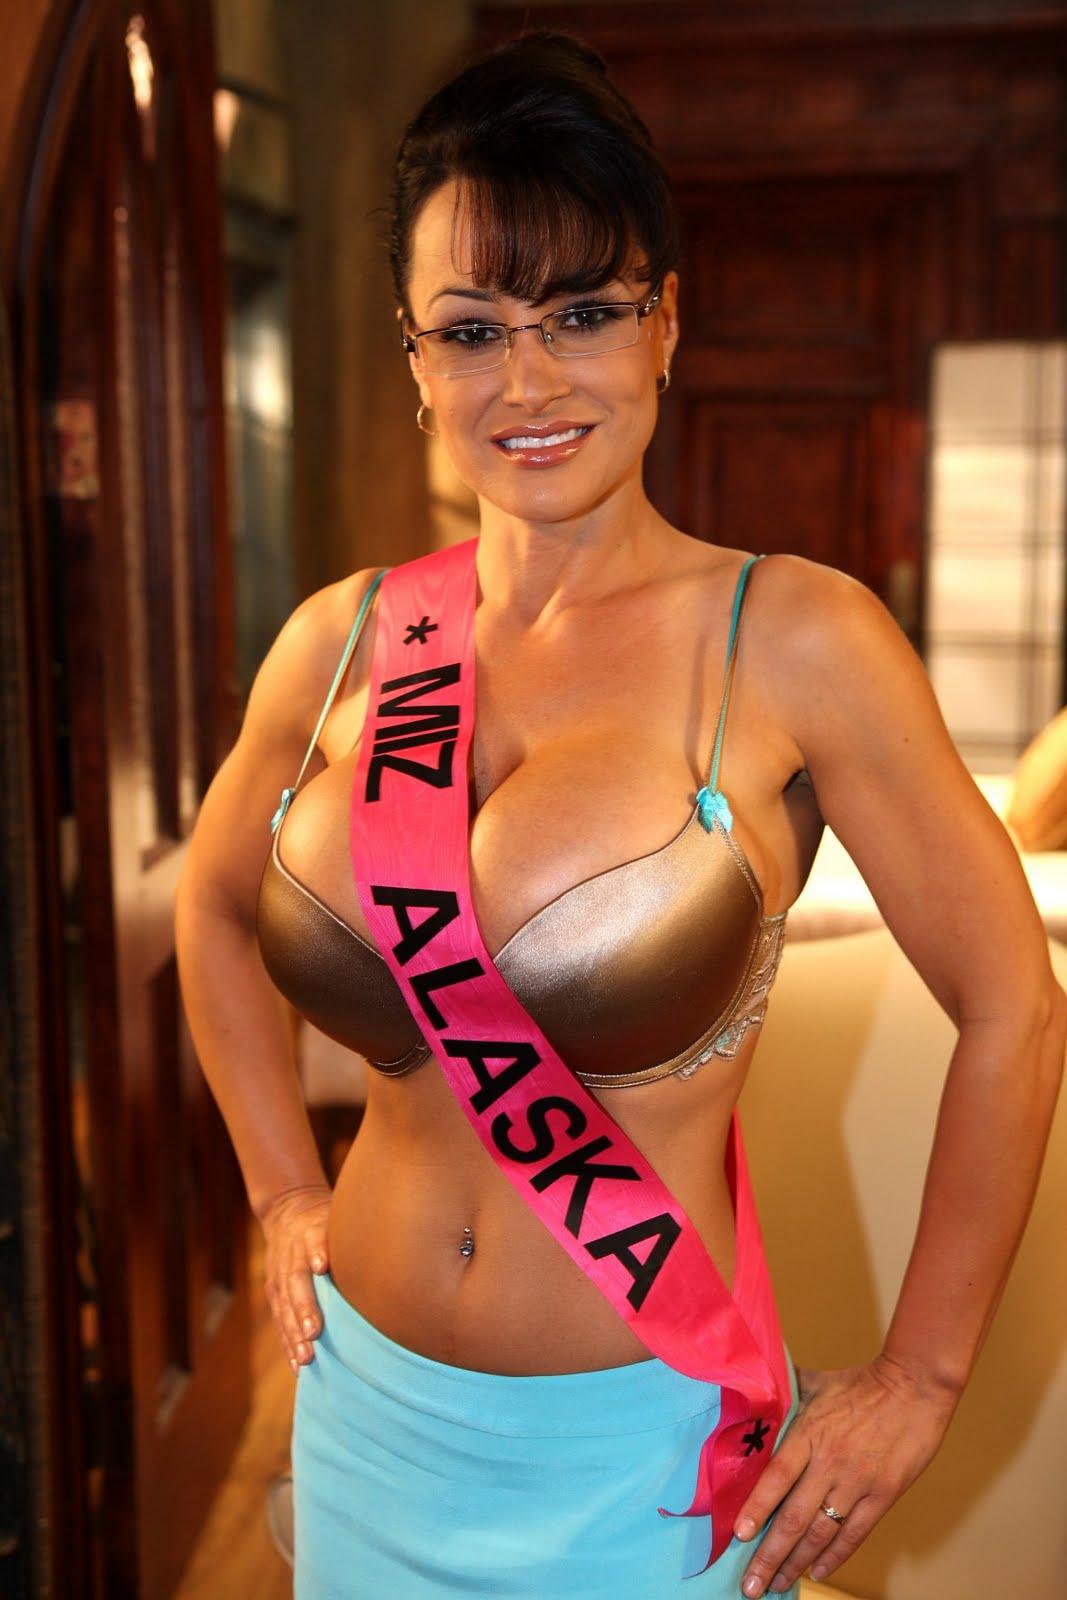 Palins lookalike sex porno